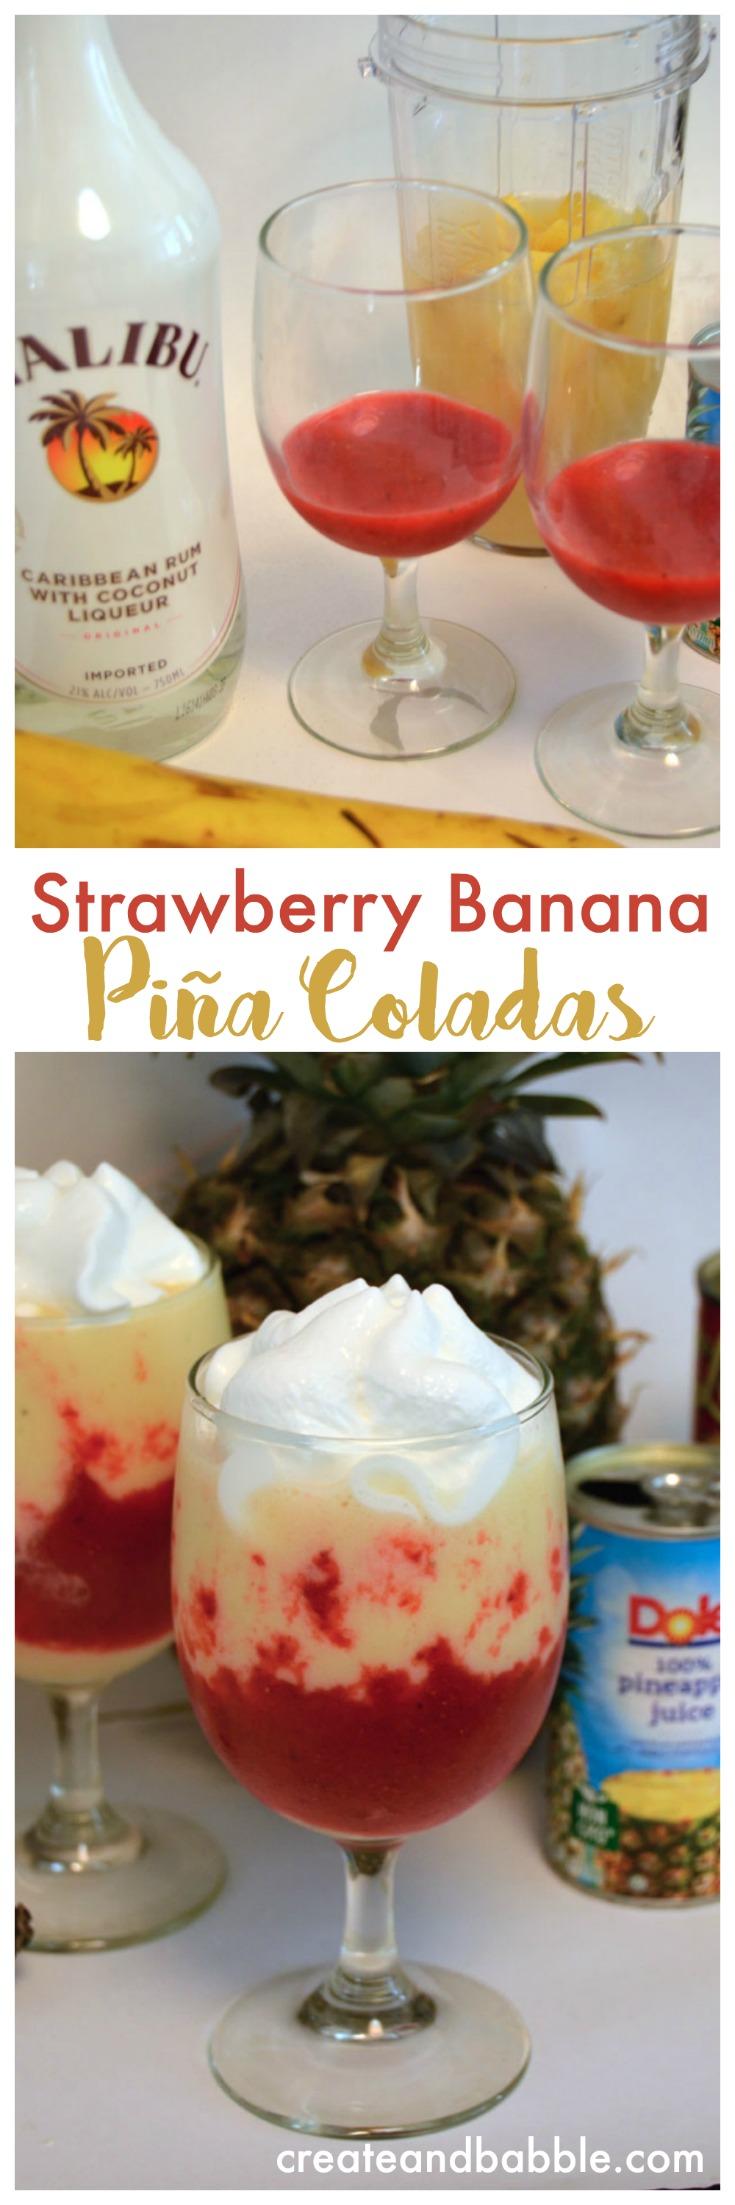 how to make strawberry banana juice